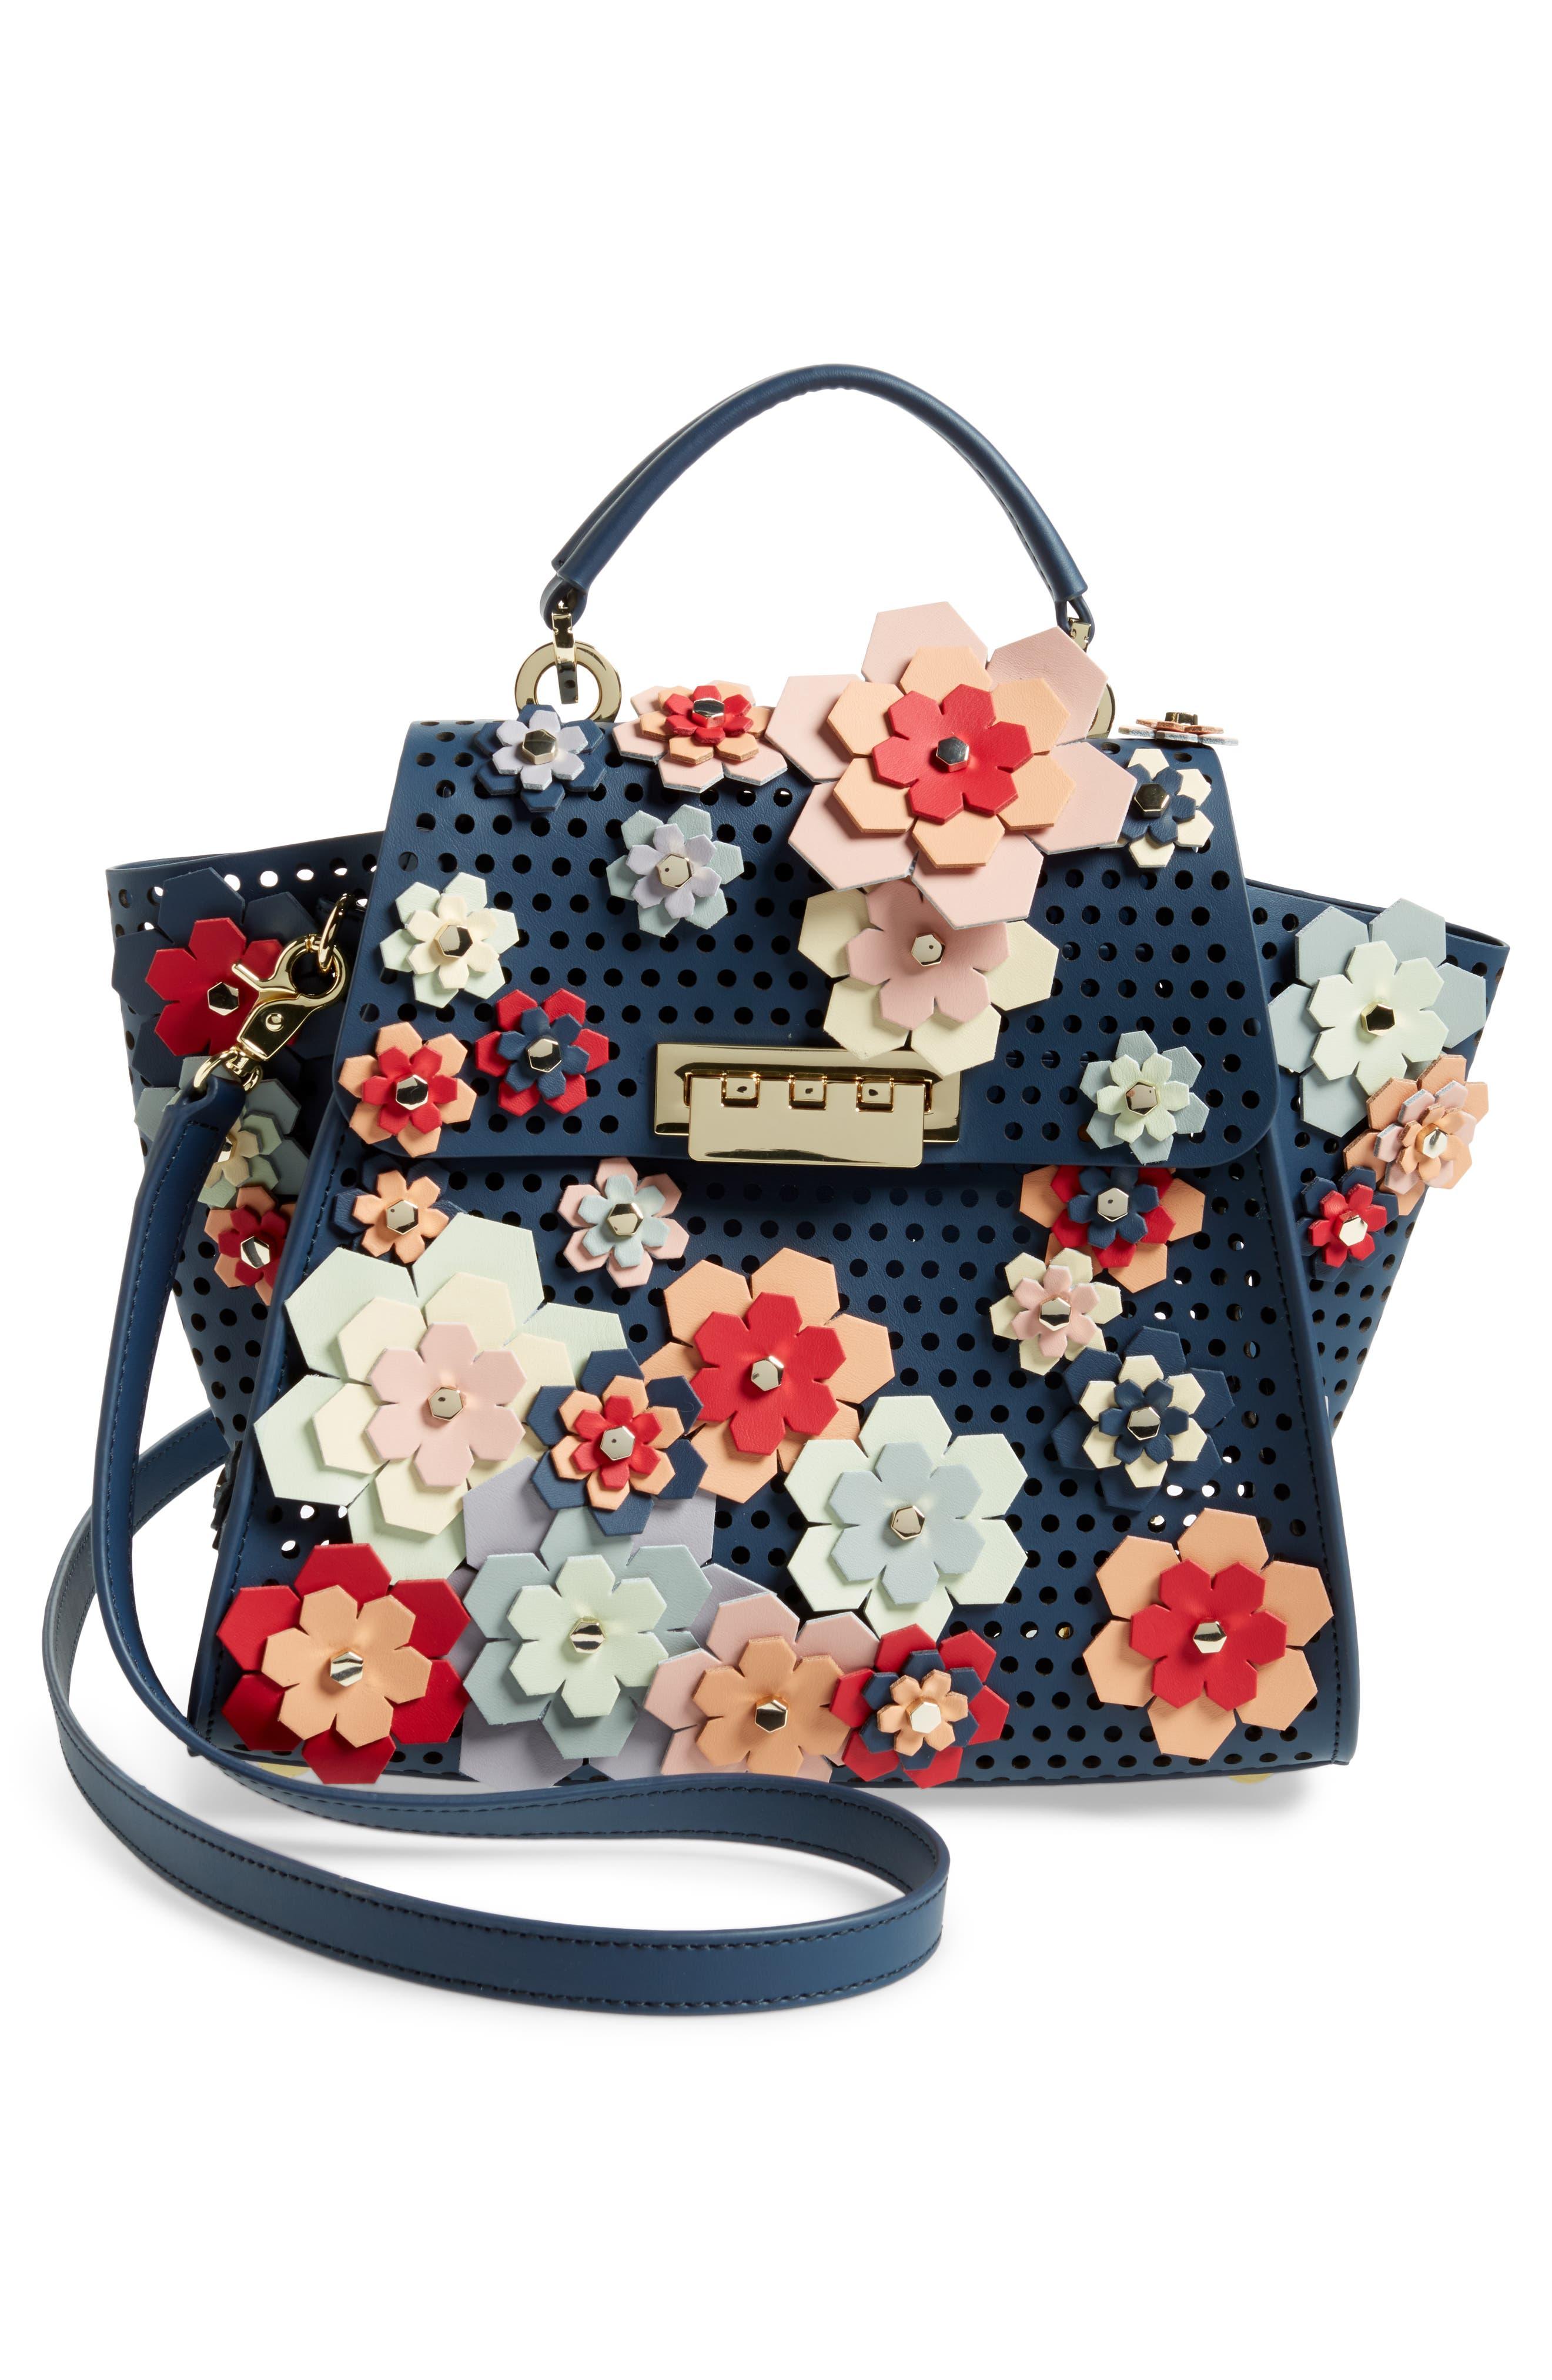 Eartha Kit Convertible Calfskin Leather Backpack,                             Alternate thumbnail 4, color,                             Blue/ Rainbow